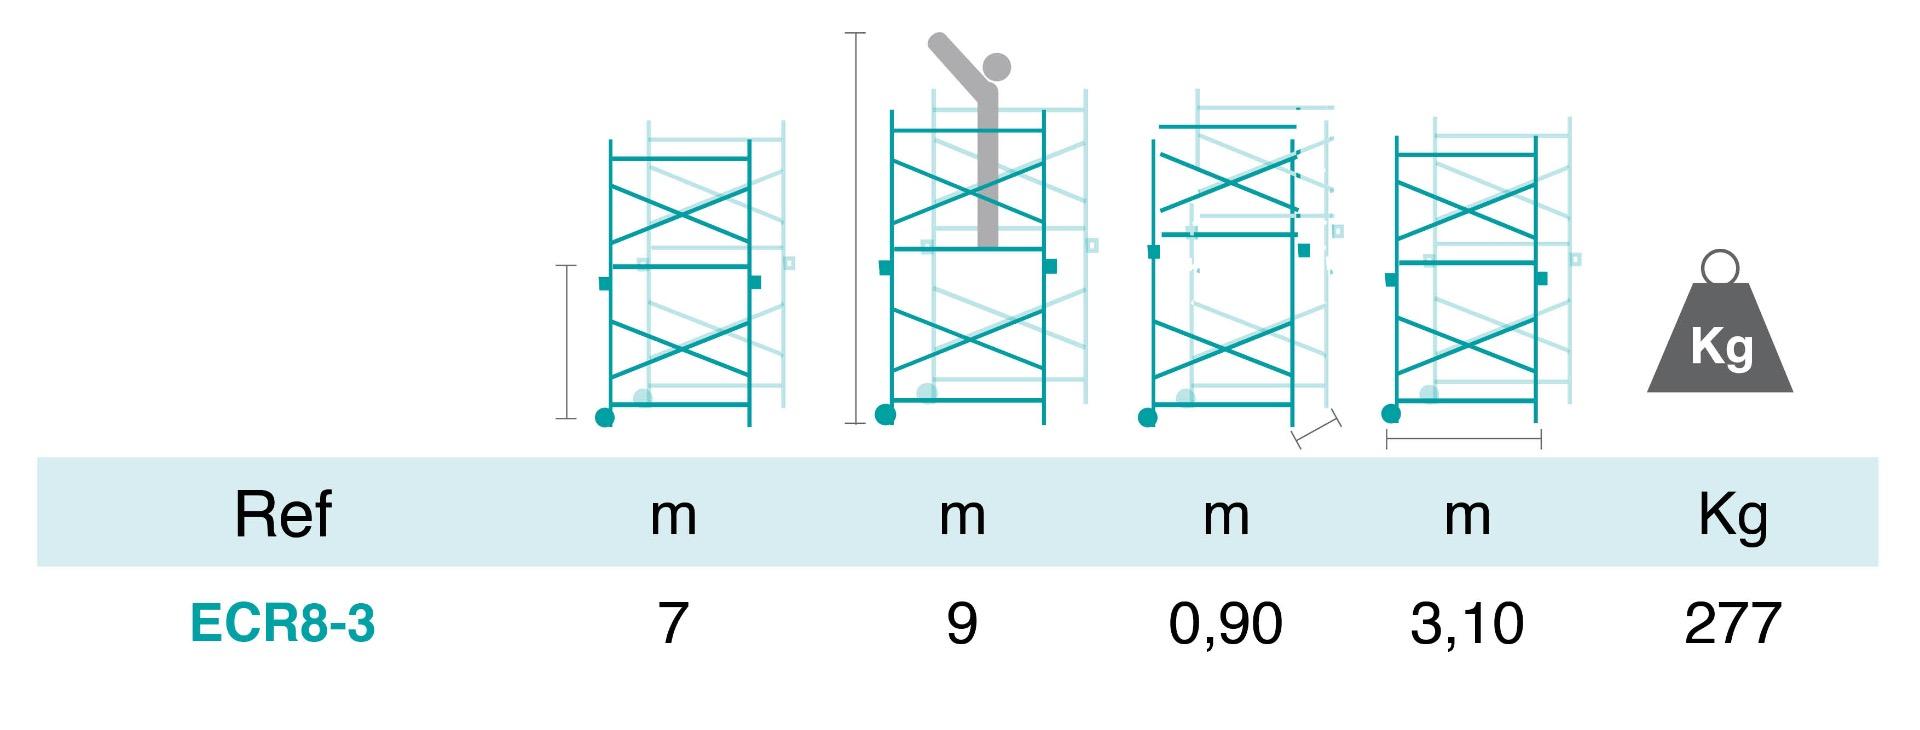 Tableau dimension échafaudage 8x3